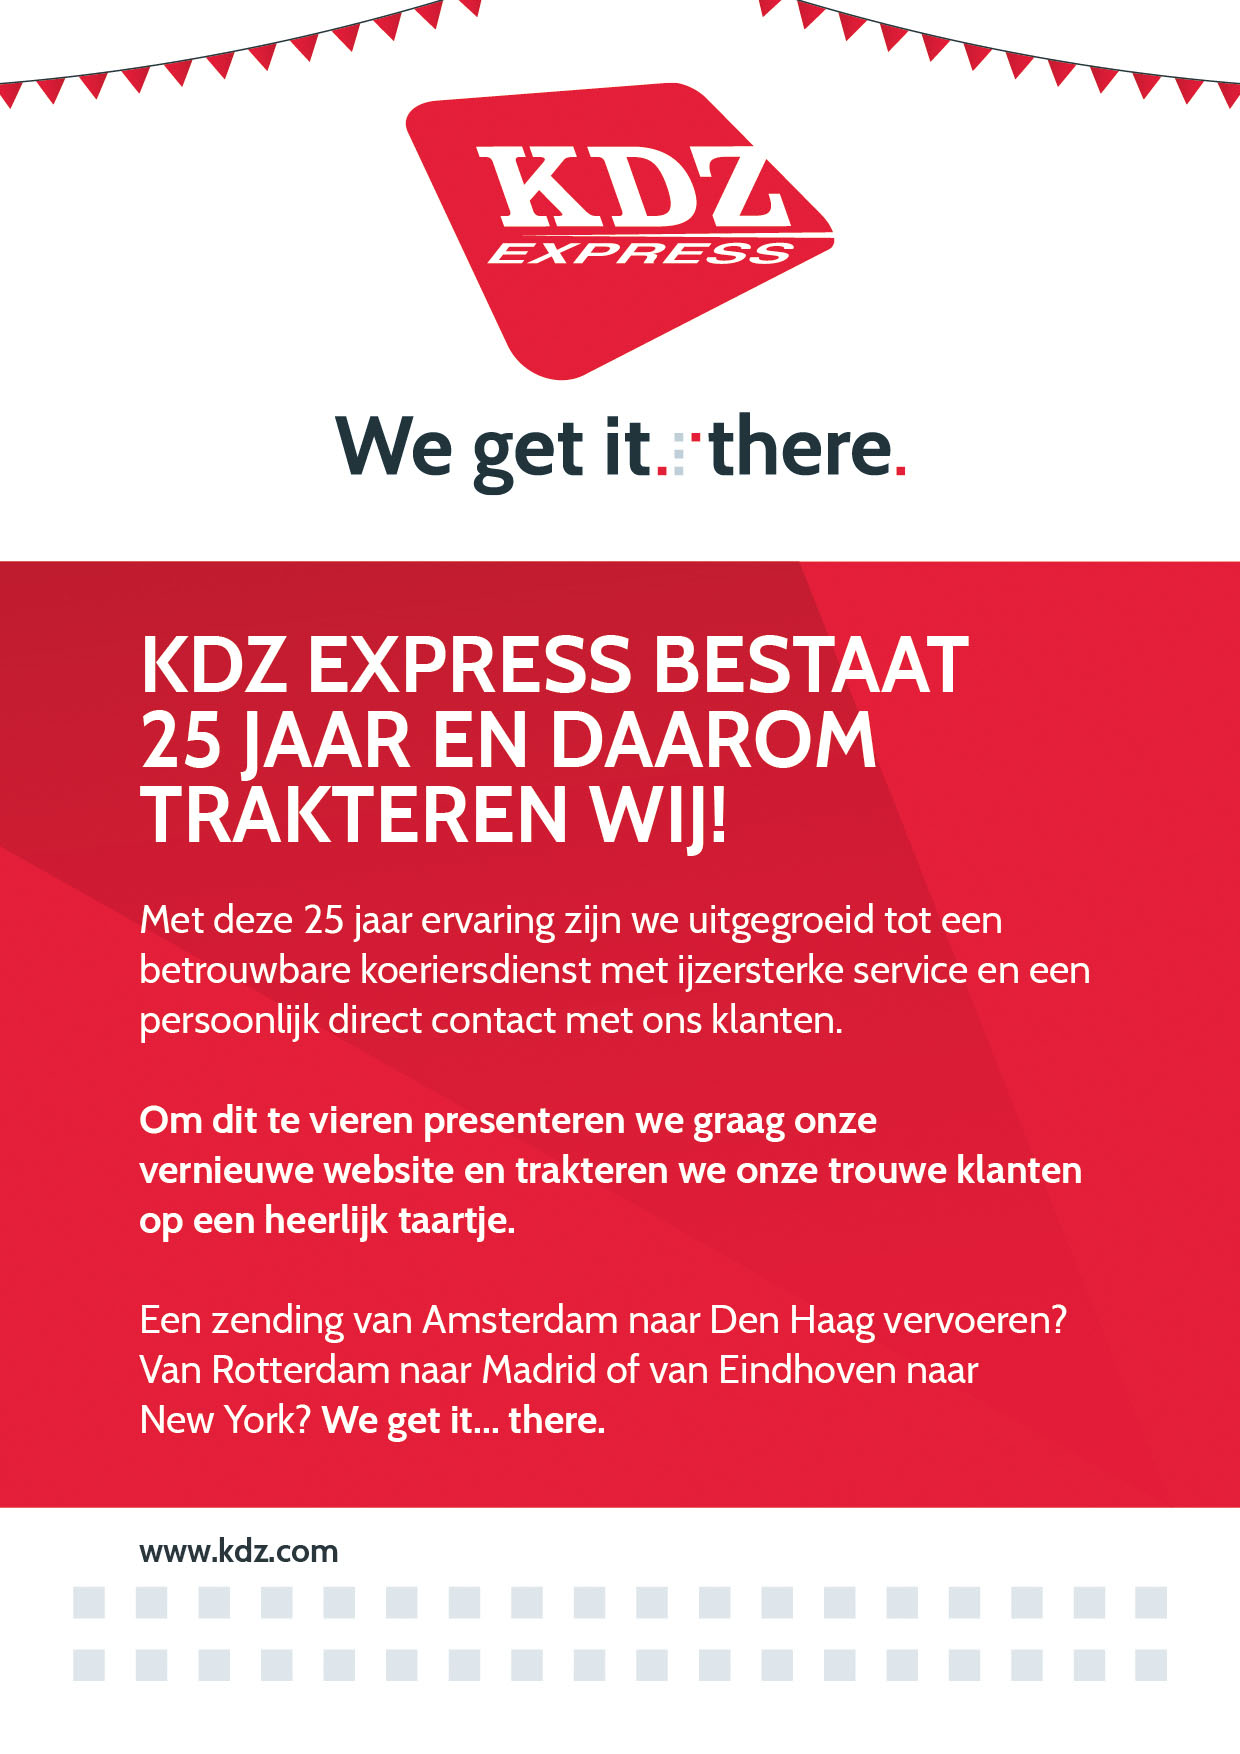 KDZ Express